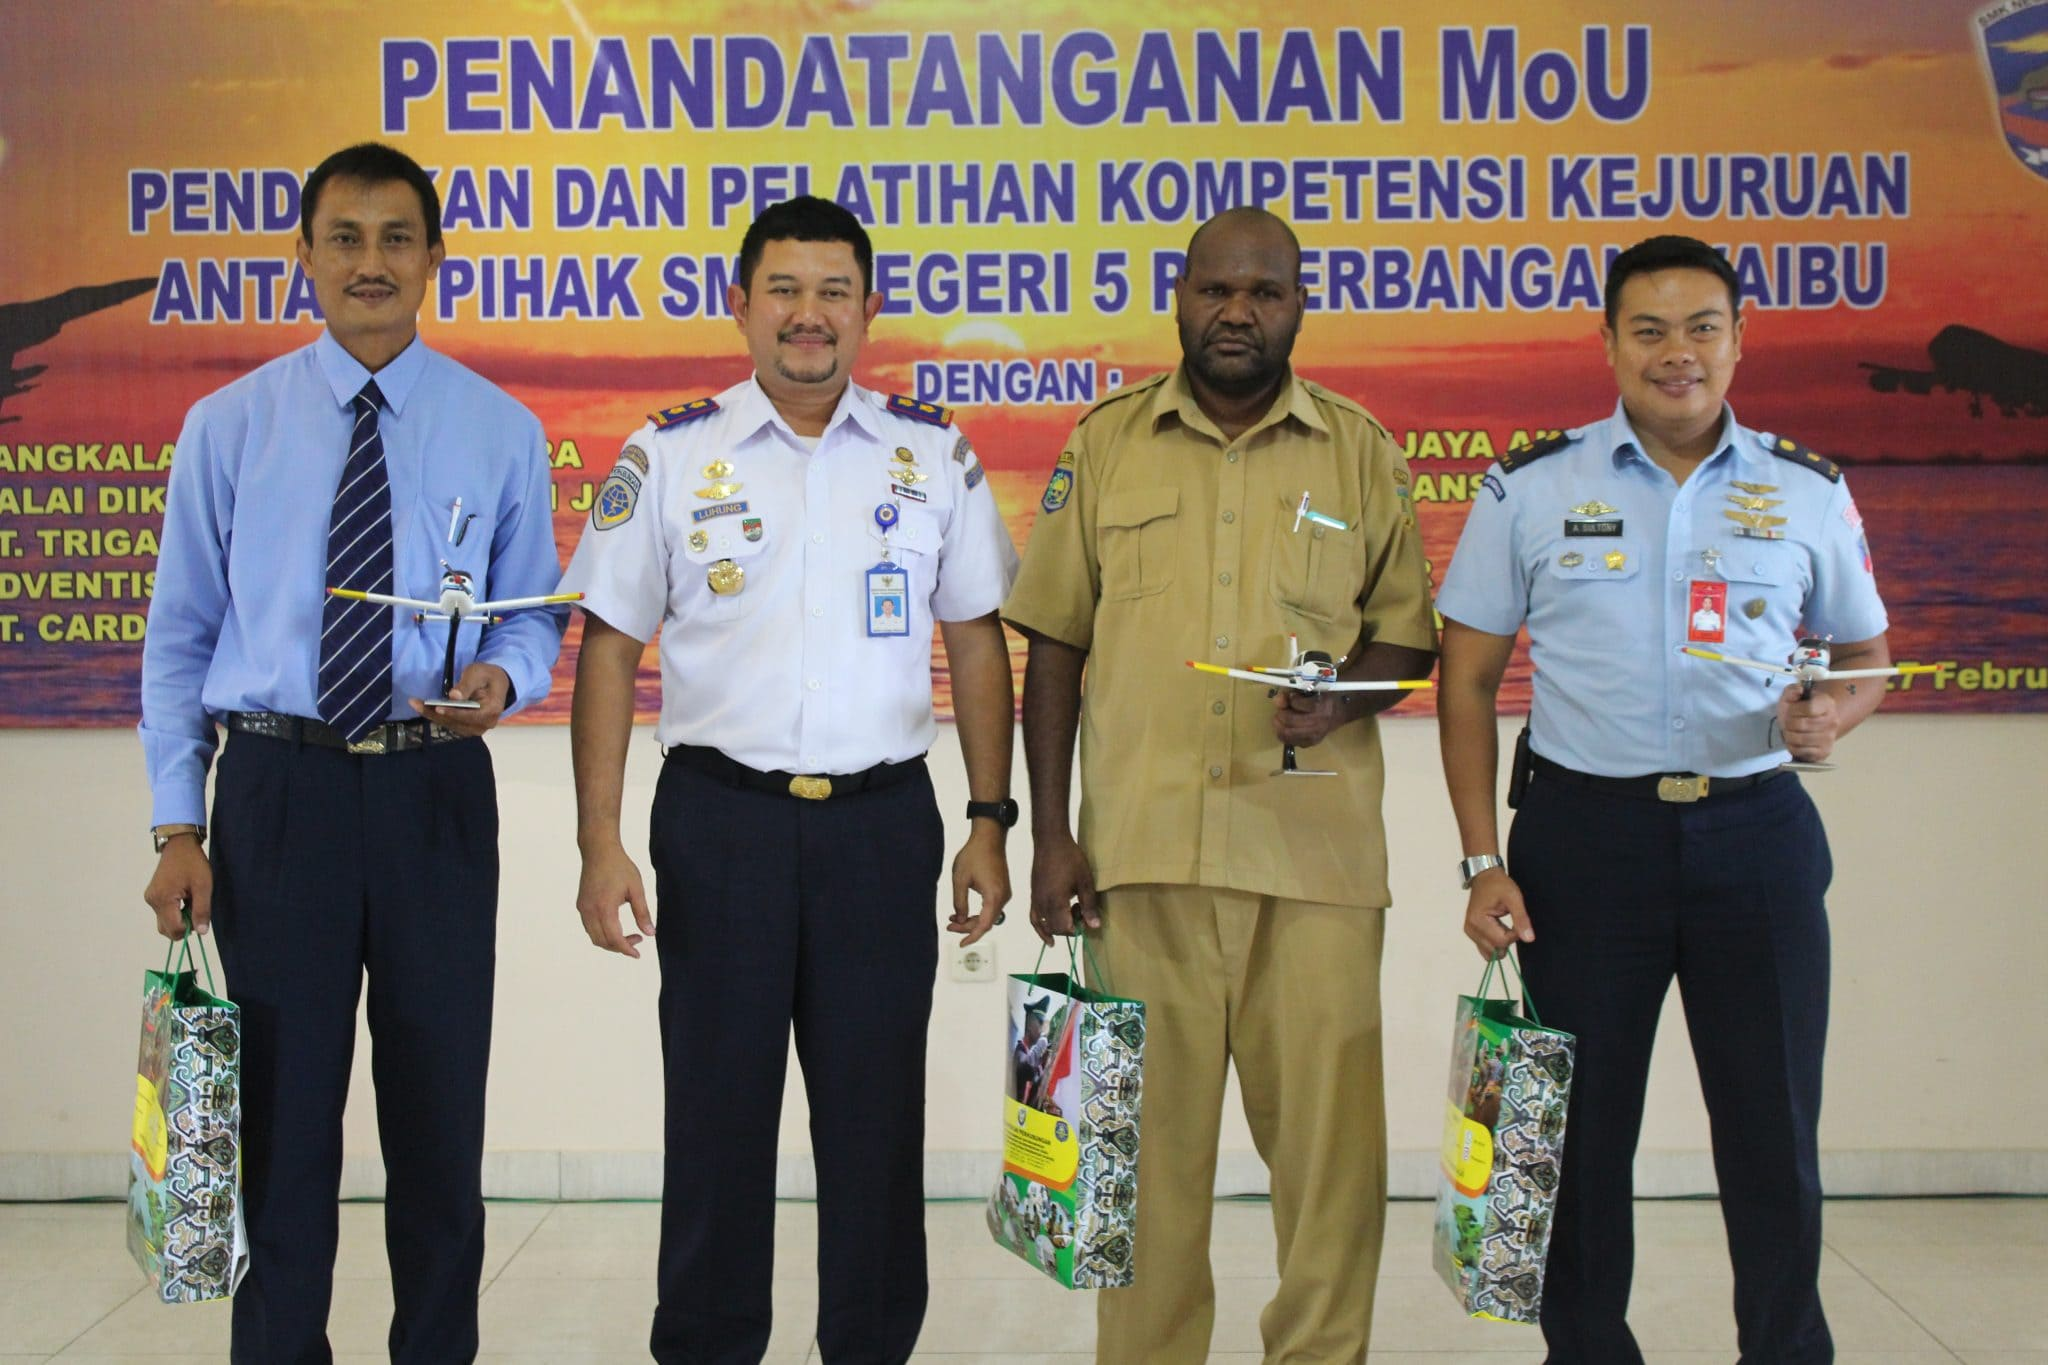 Penandatangan MoU SMK 5 Penerbangan Waibu